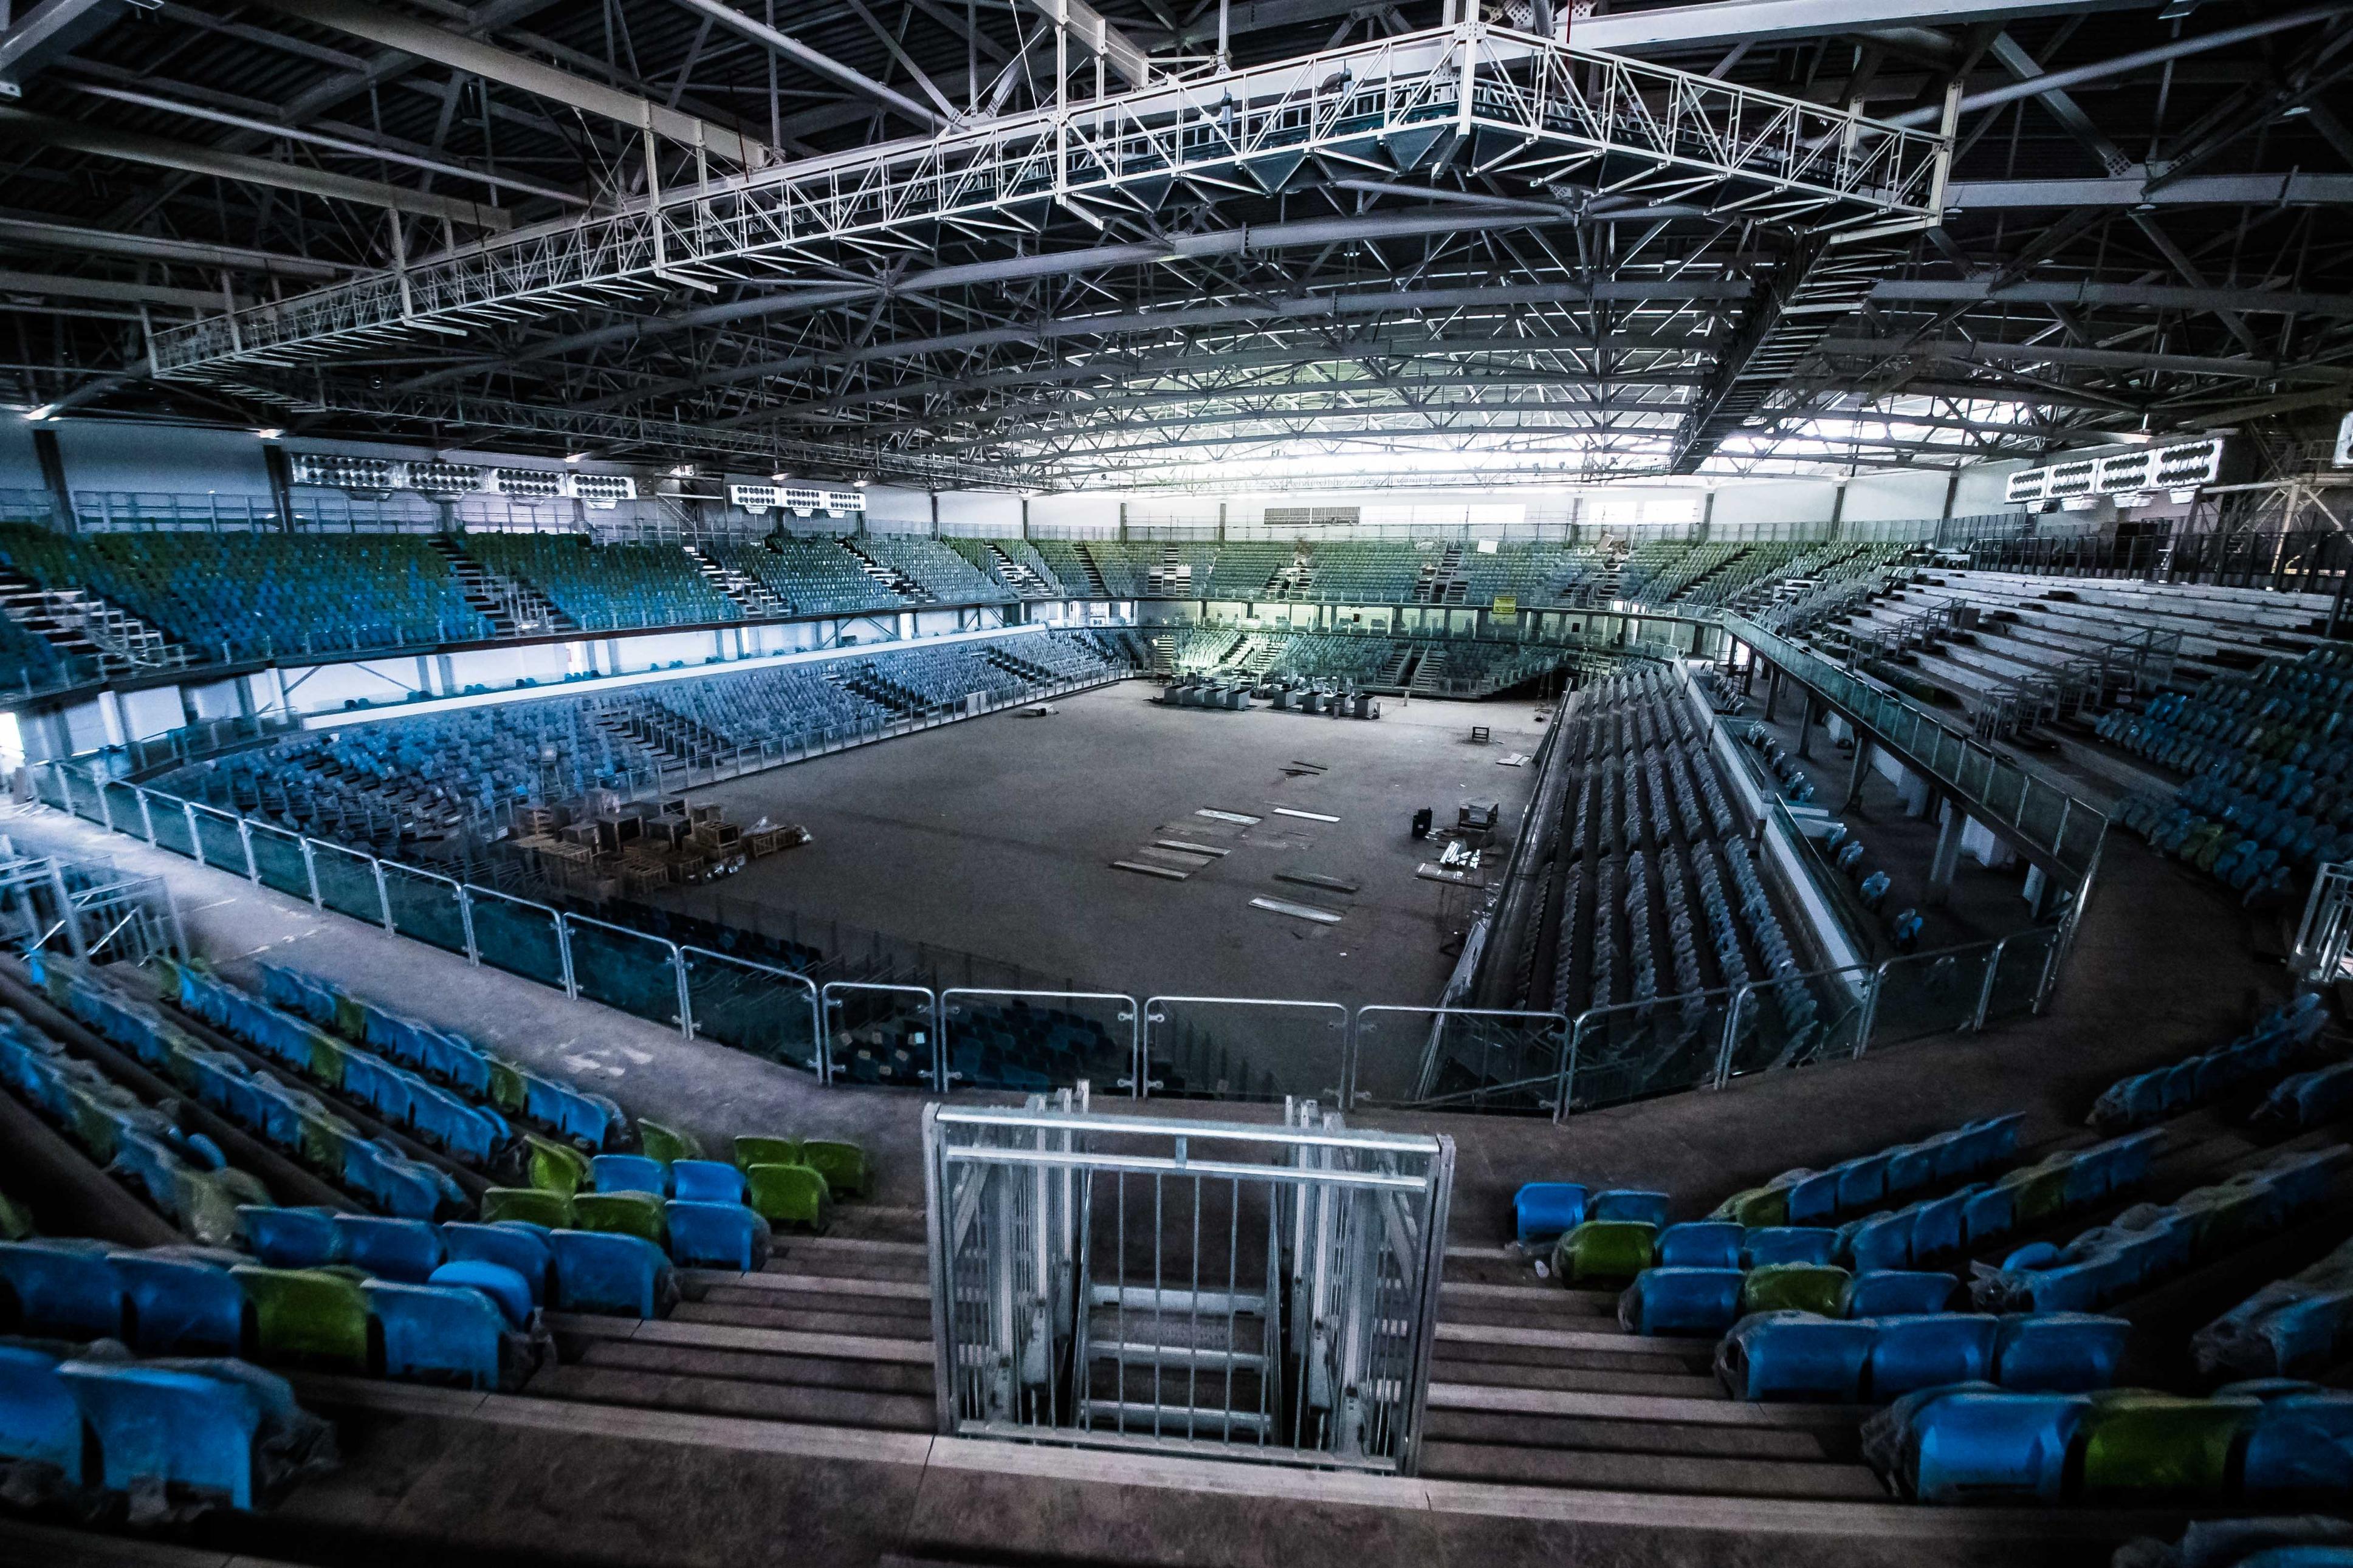 Parque-Olimpico-Arena-Carioca-2-Renato-Sette-Camara_Prefeitura-do-Rio